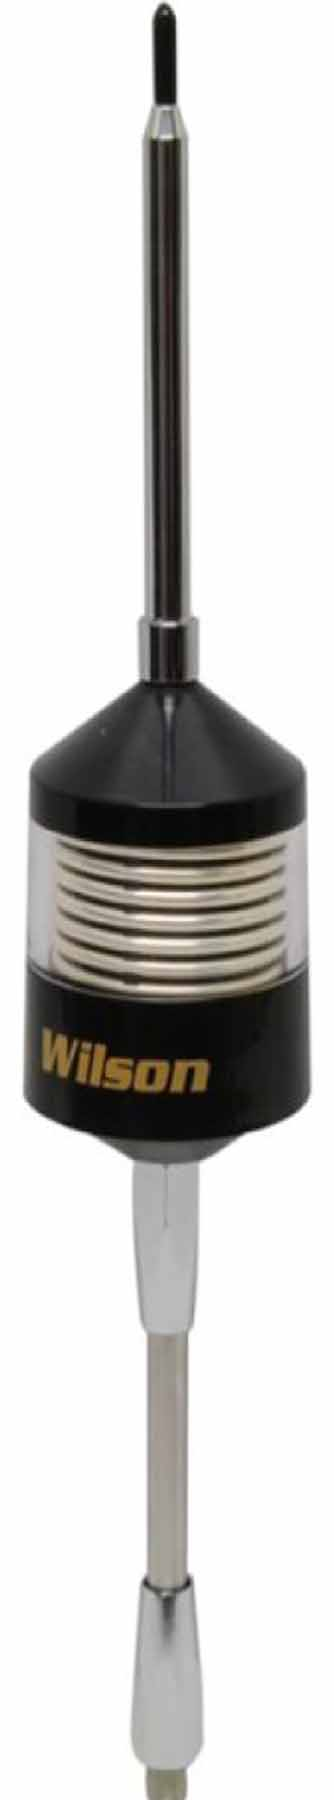 "3500 WATTS 10"" SHAFT W/49"" WHIP (CLEAR/BLACK)"